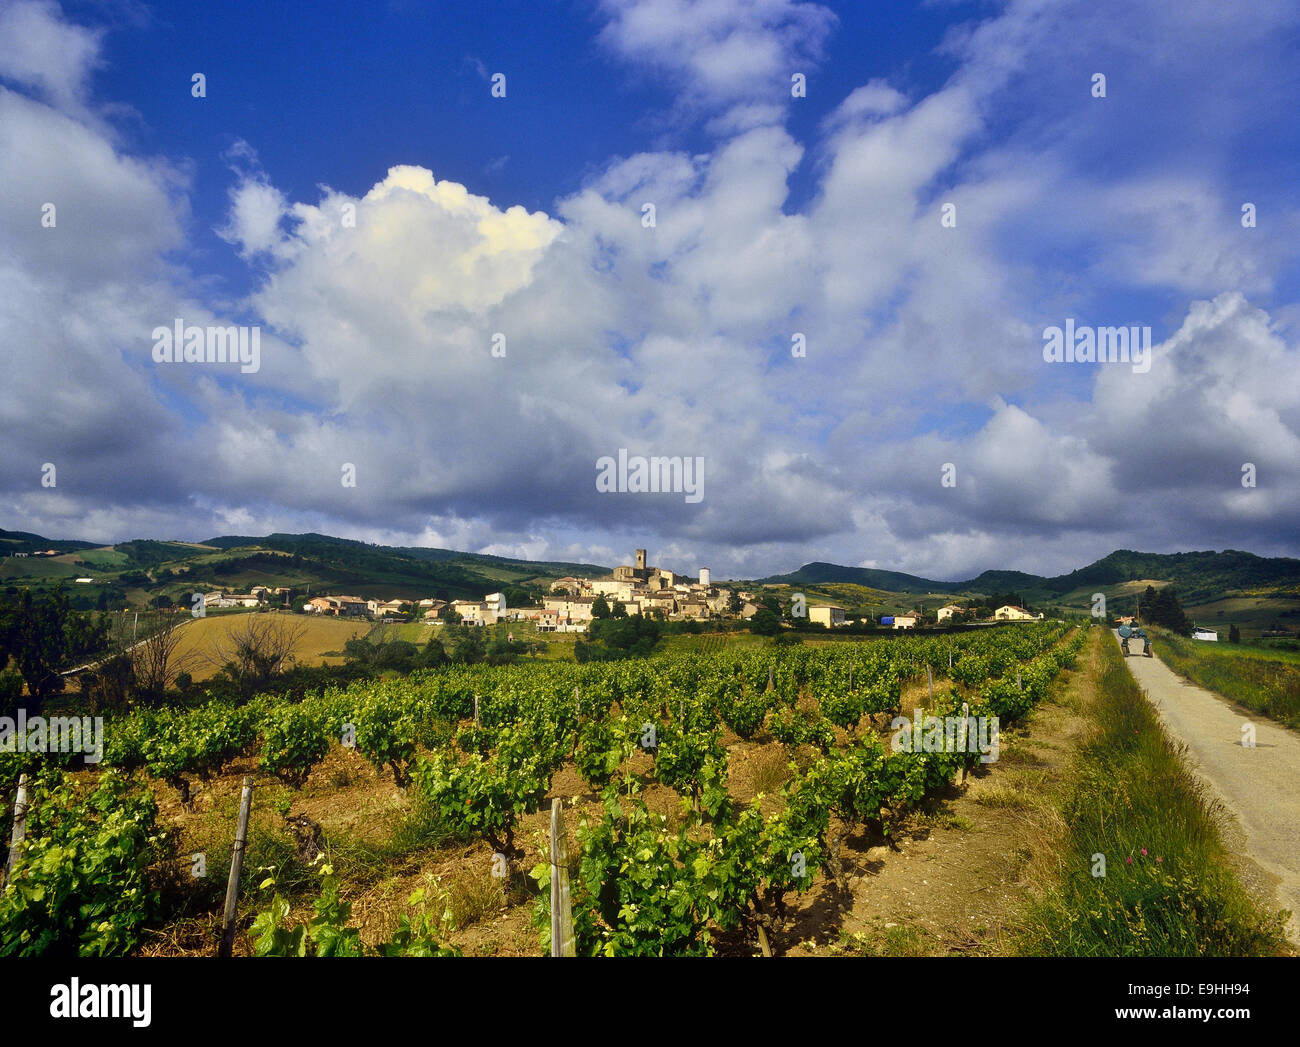 Vineyards at Villelongue-d'Aude. Aude department. France - Stock Image